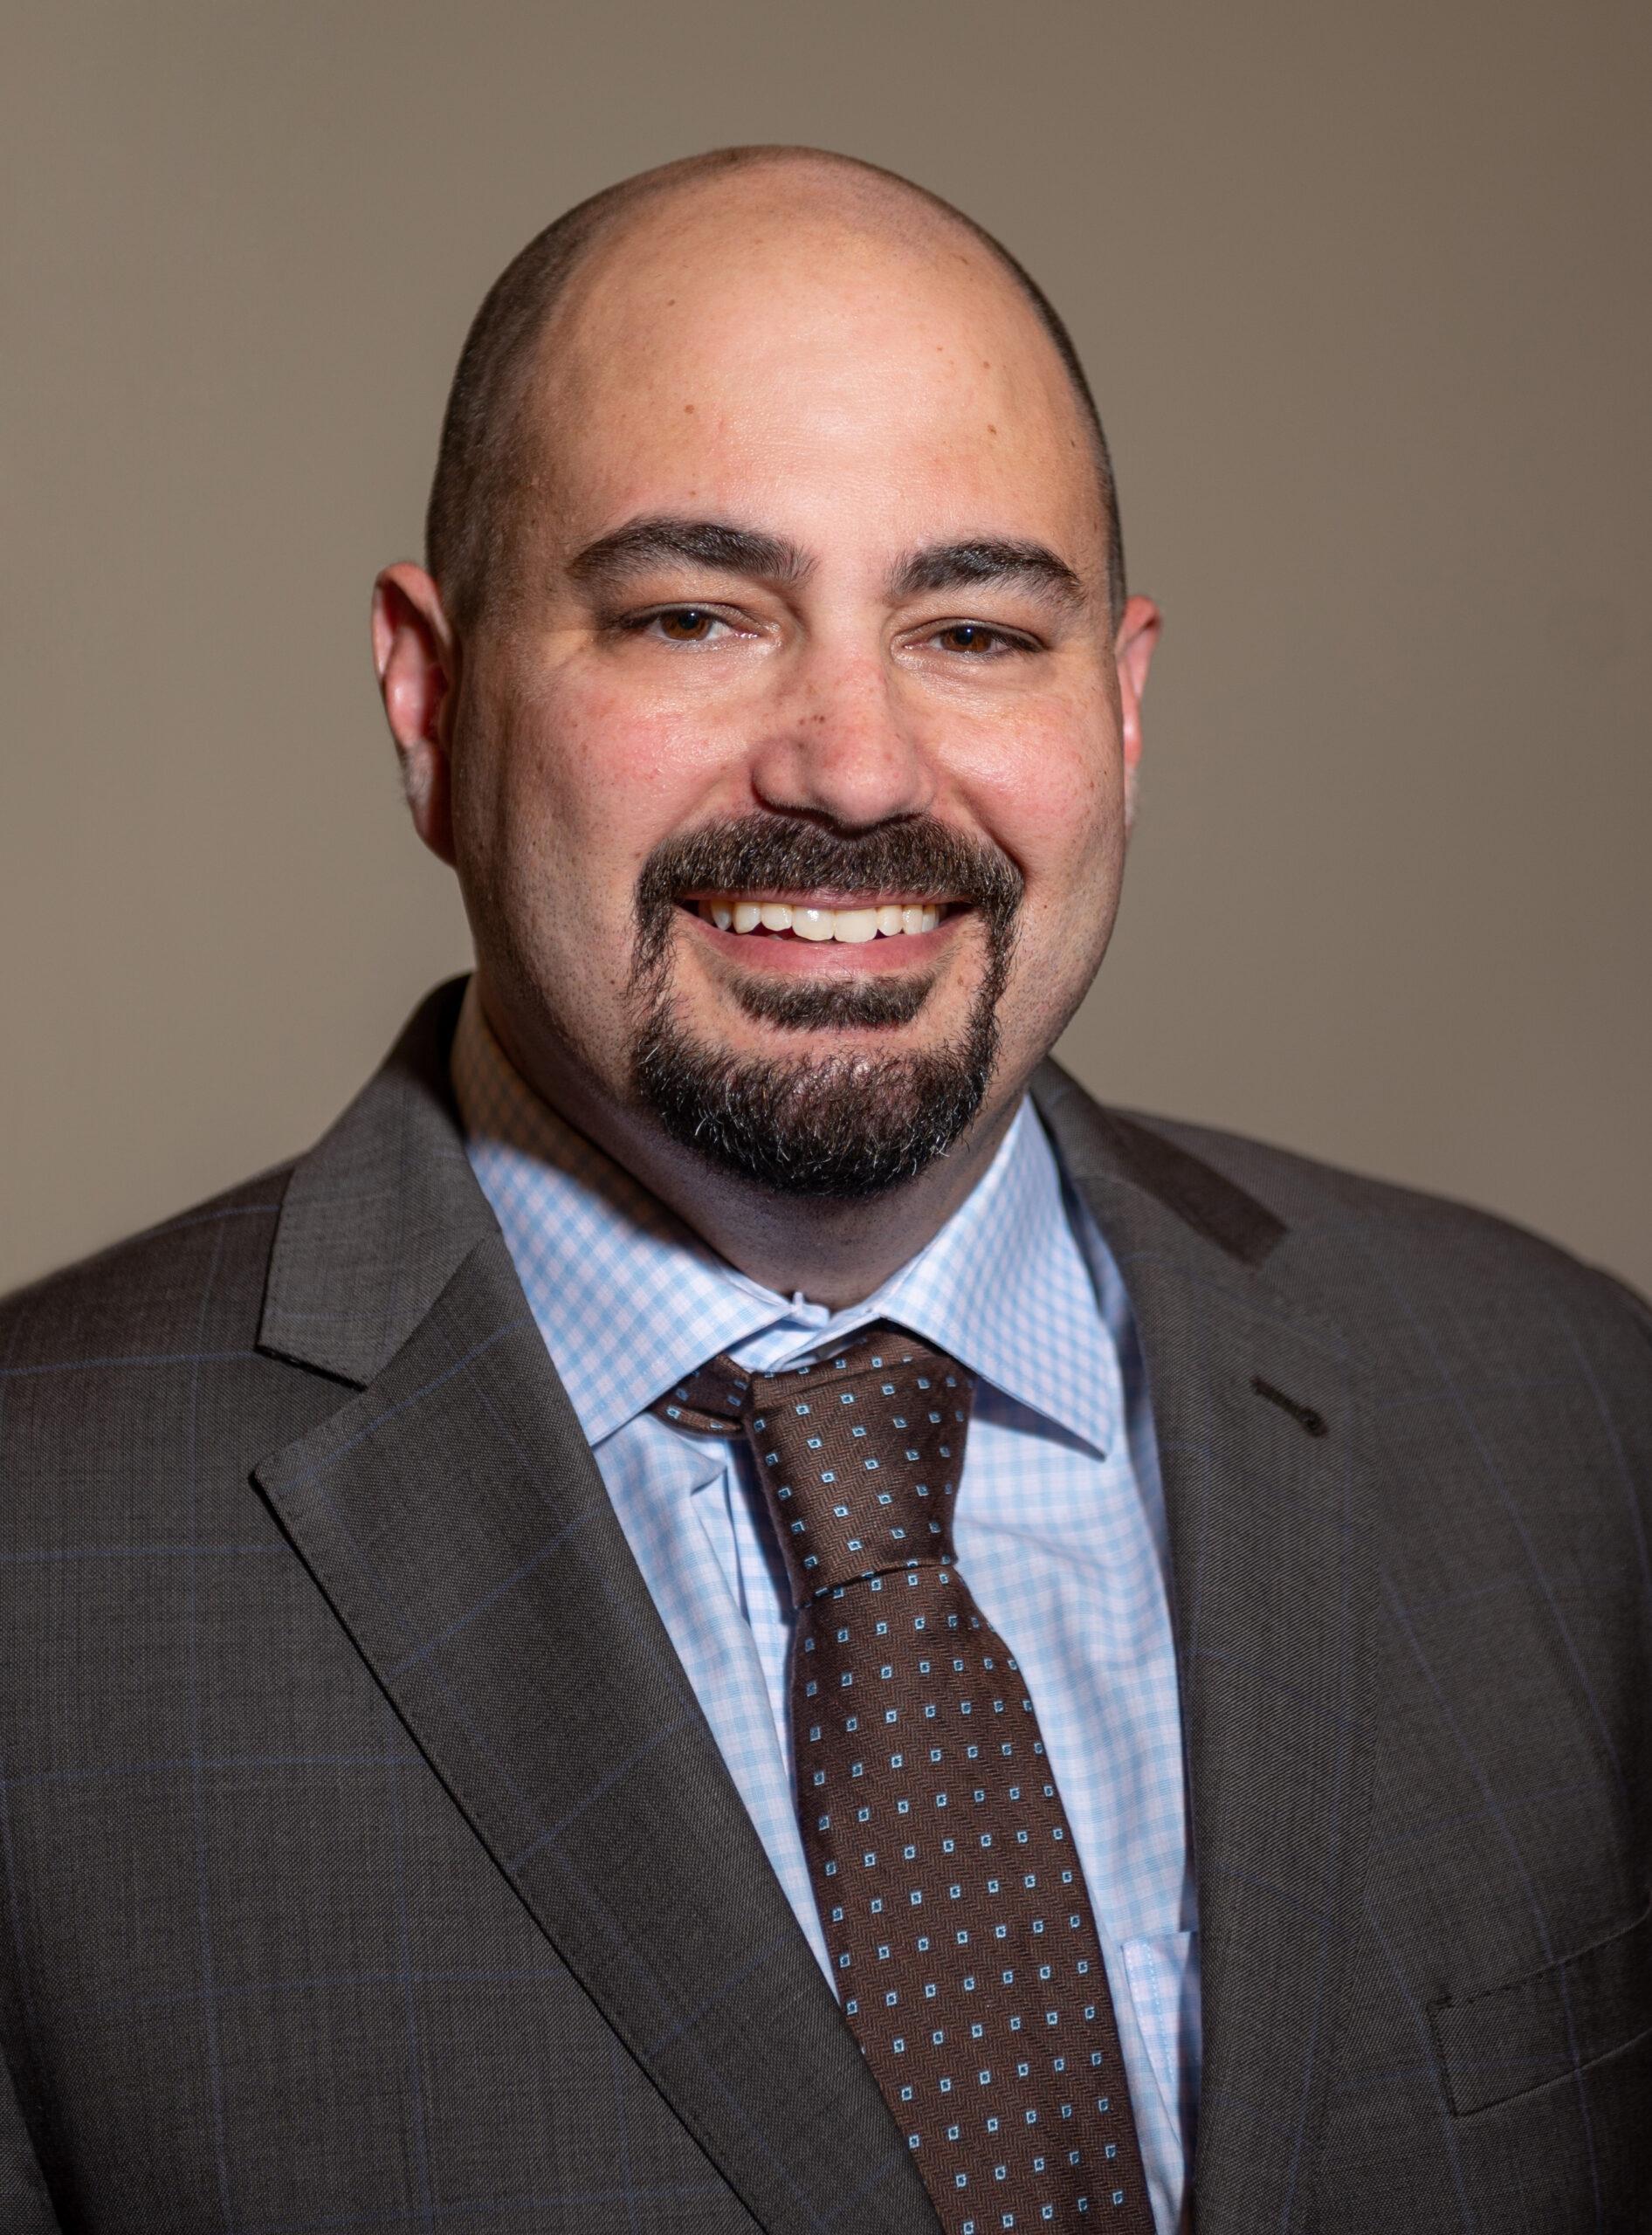 Ryan Fingerhut - Director of Client Services